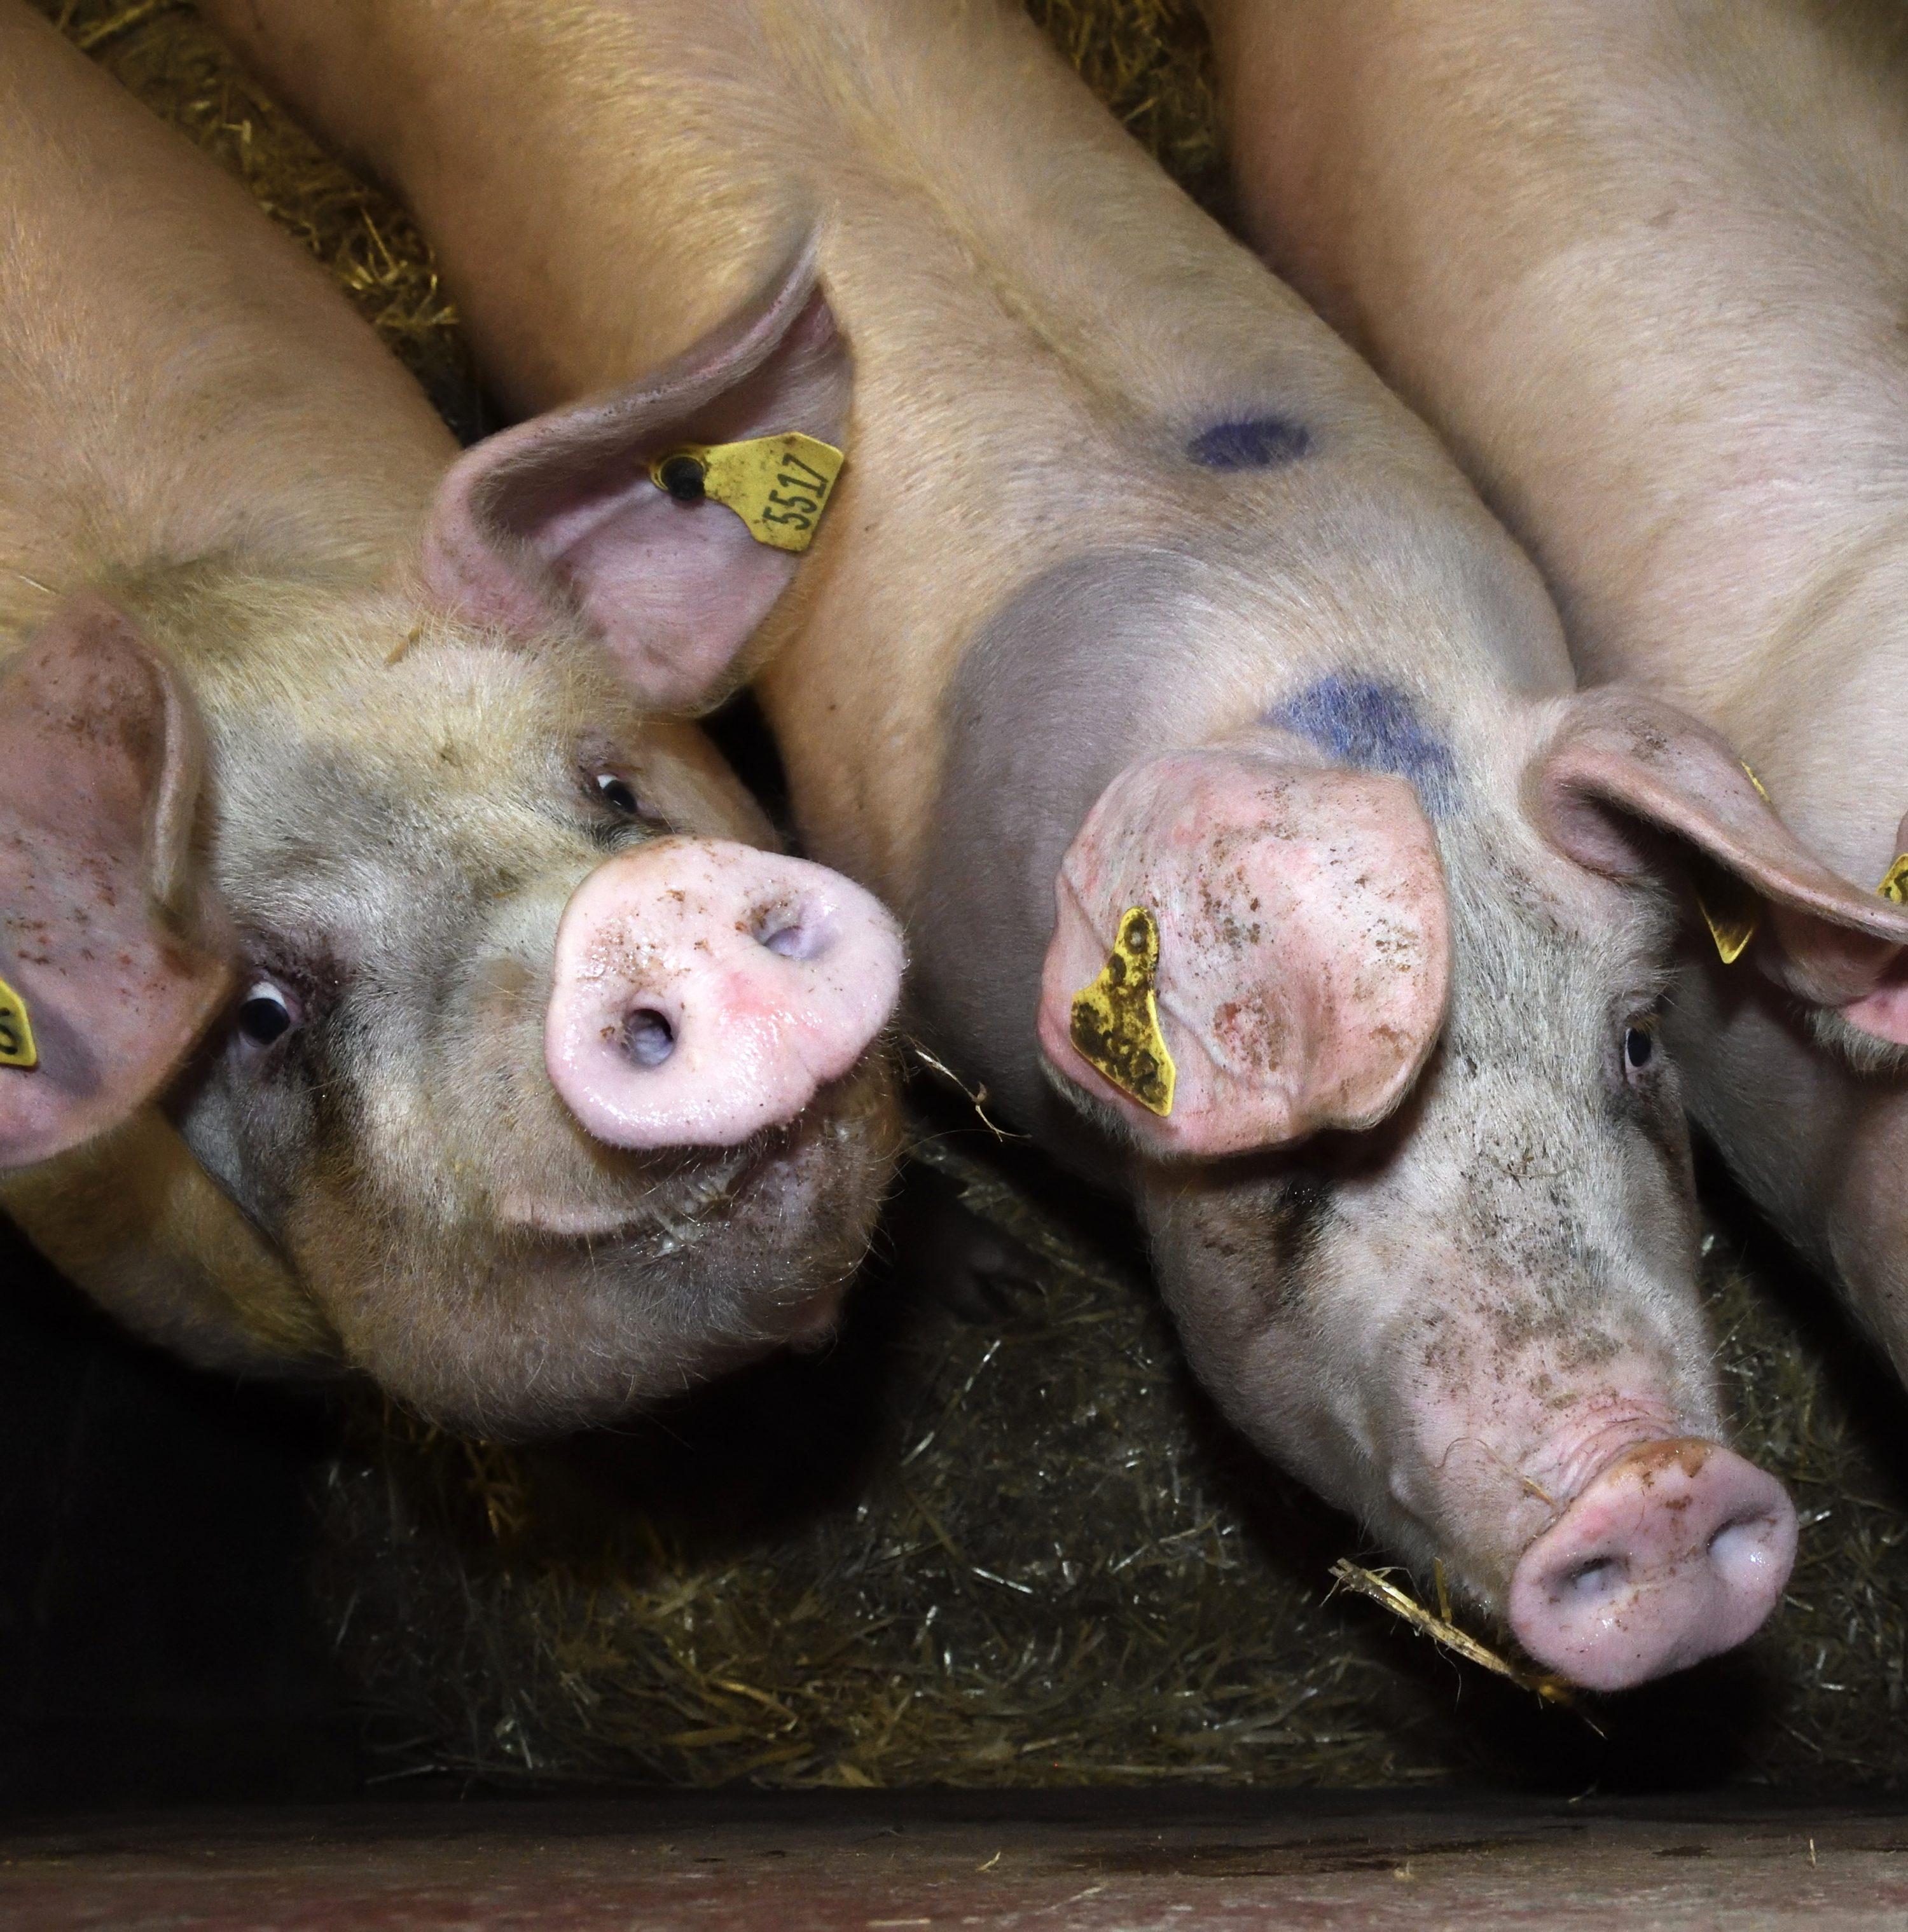 Fir Tree Pig Farm - Animal Equality